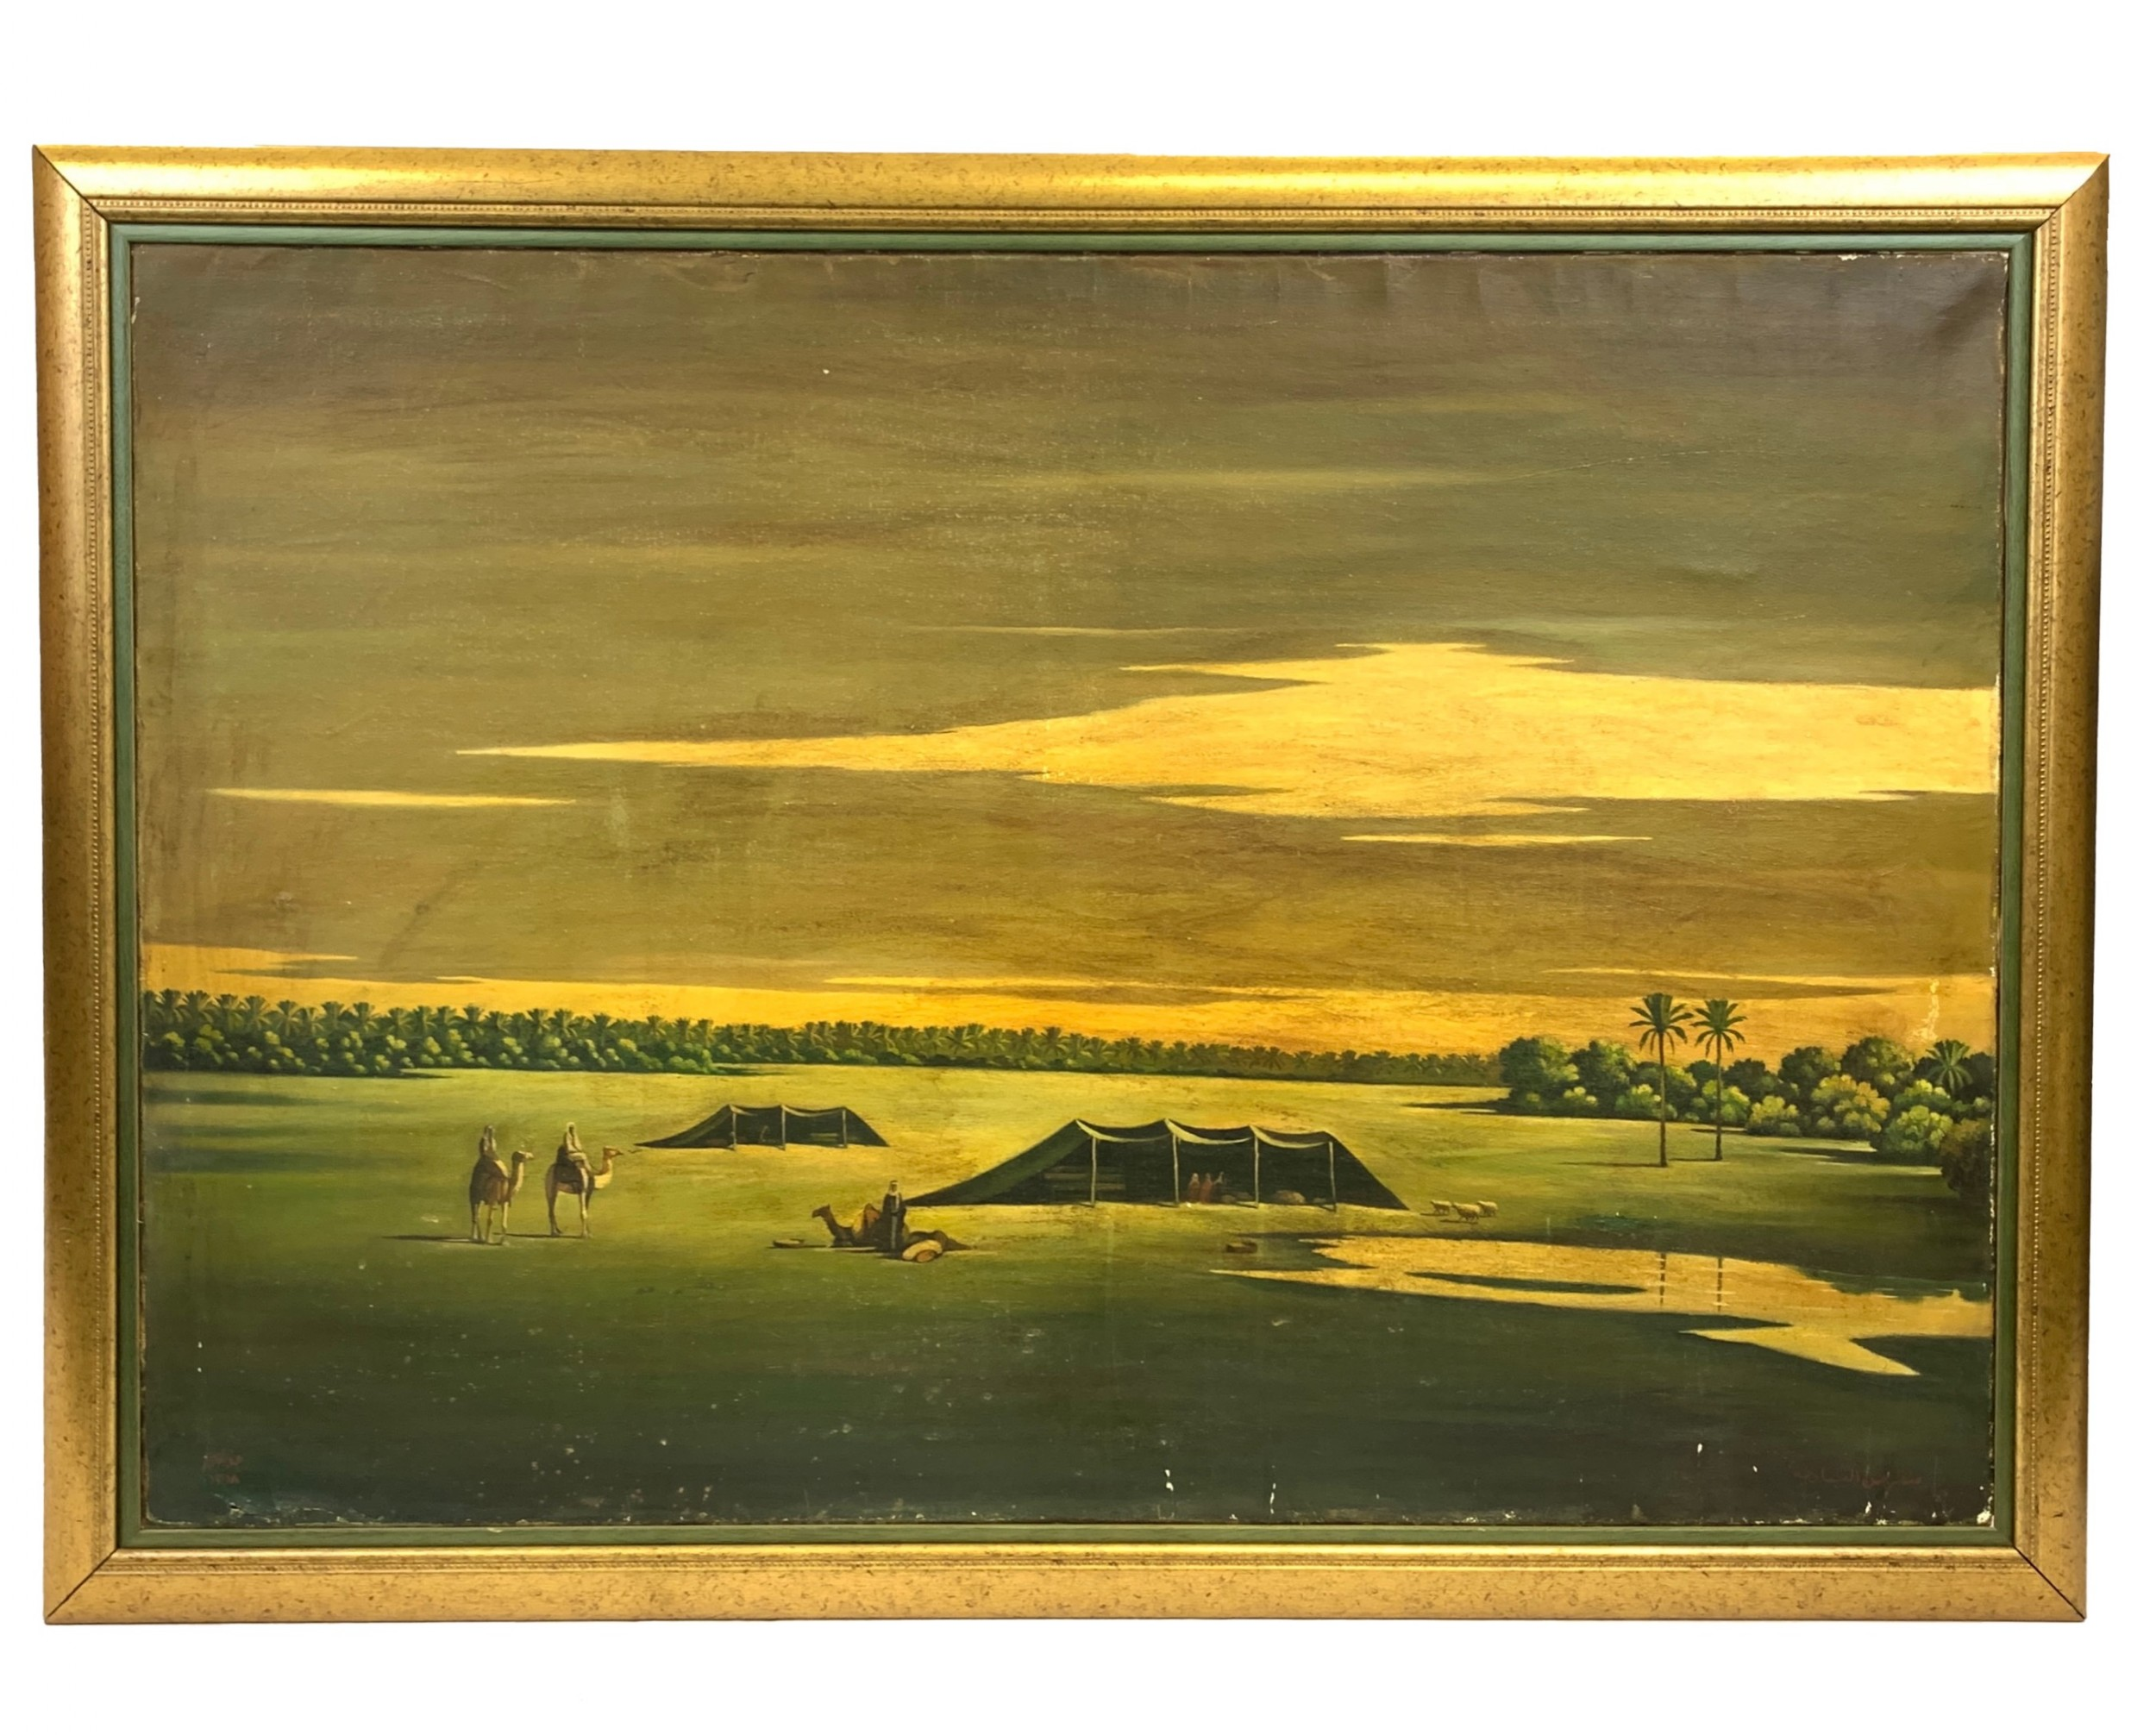 view of bedieh the wilderness oil on canvas painting by abdul kadir al rassam iraq 18821952